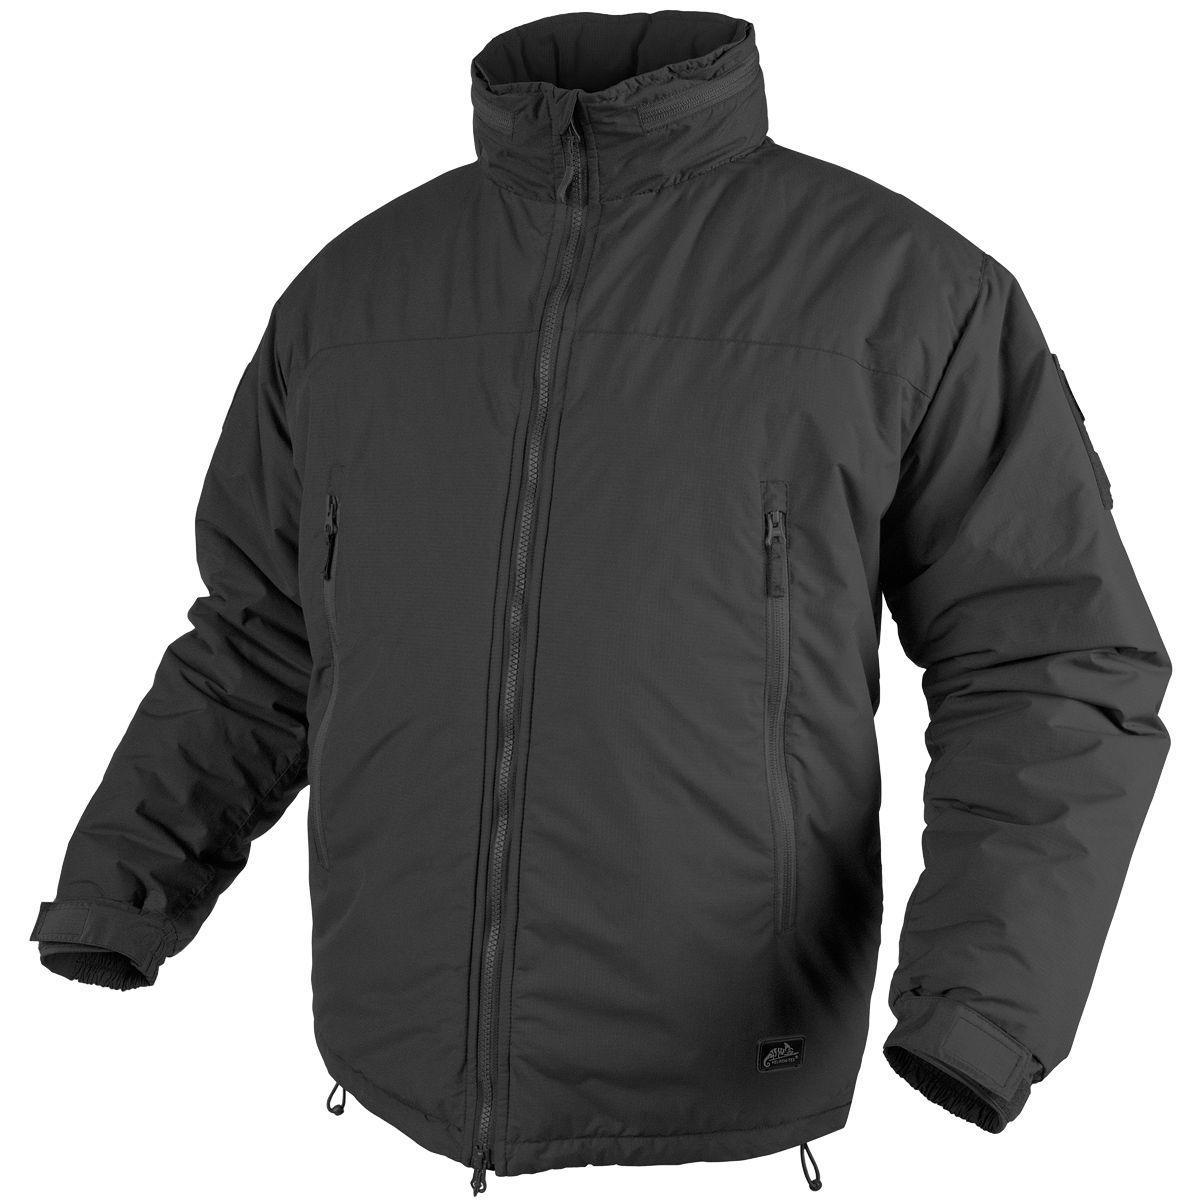 Куртка Helikon Level 7 Winter Jacket Black S, M, L, XL, XXL regular (K